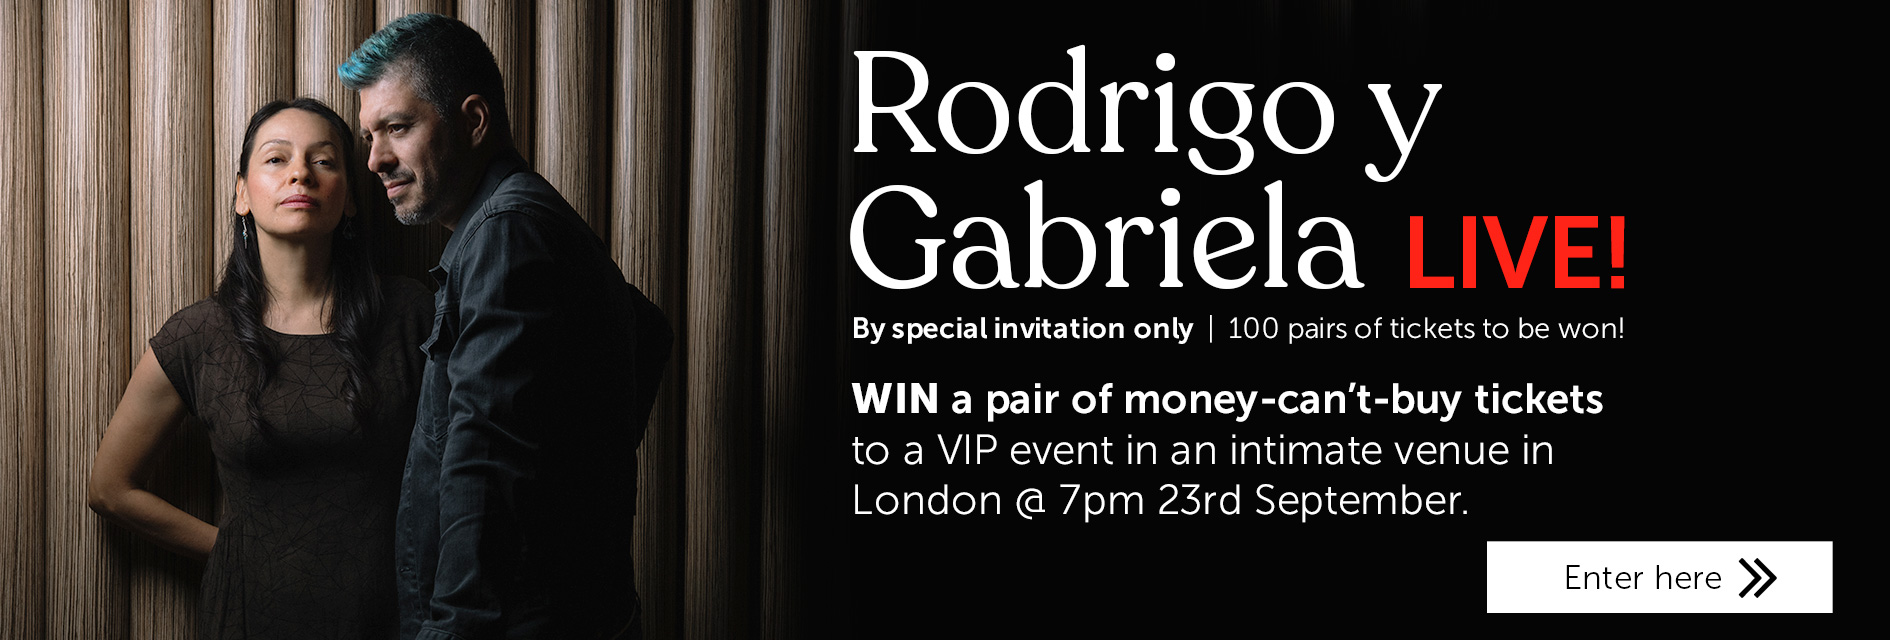 Win tickets to see Rodrigo y Gabriela live